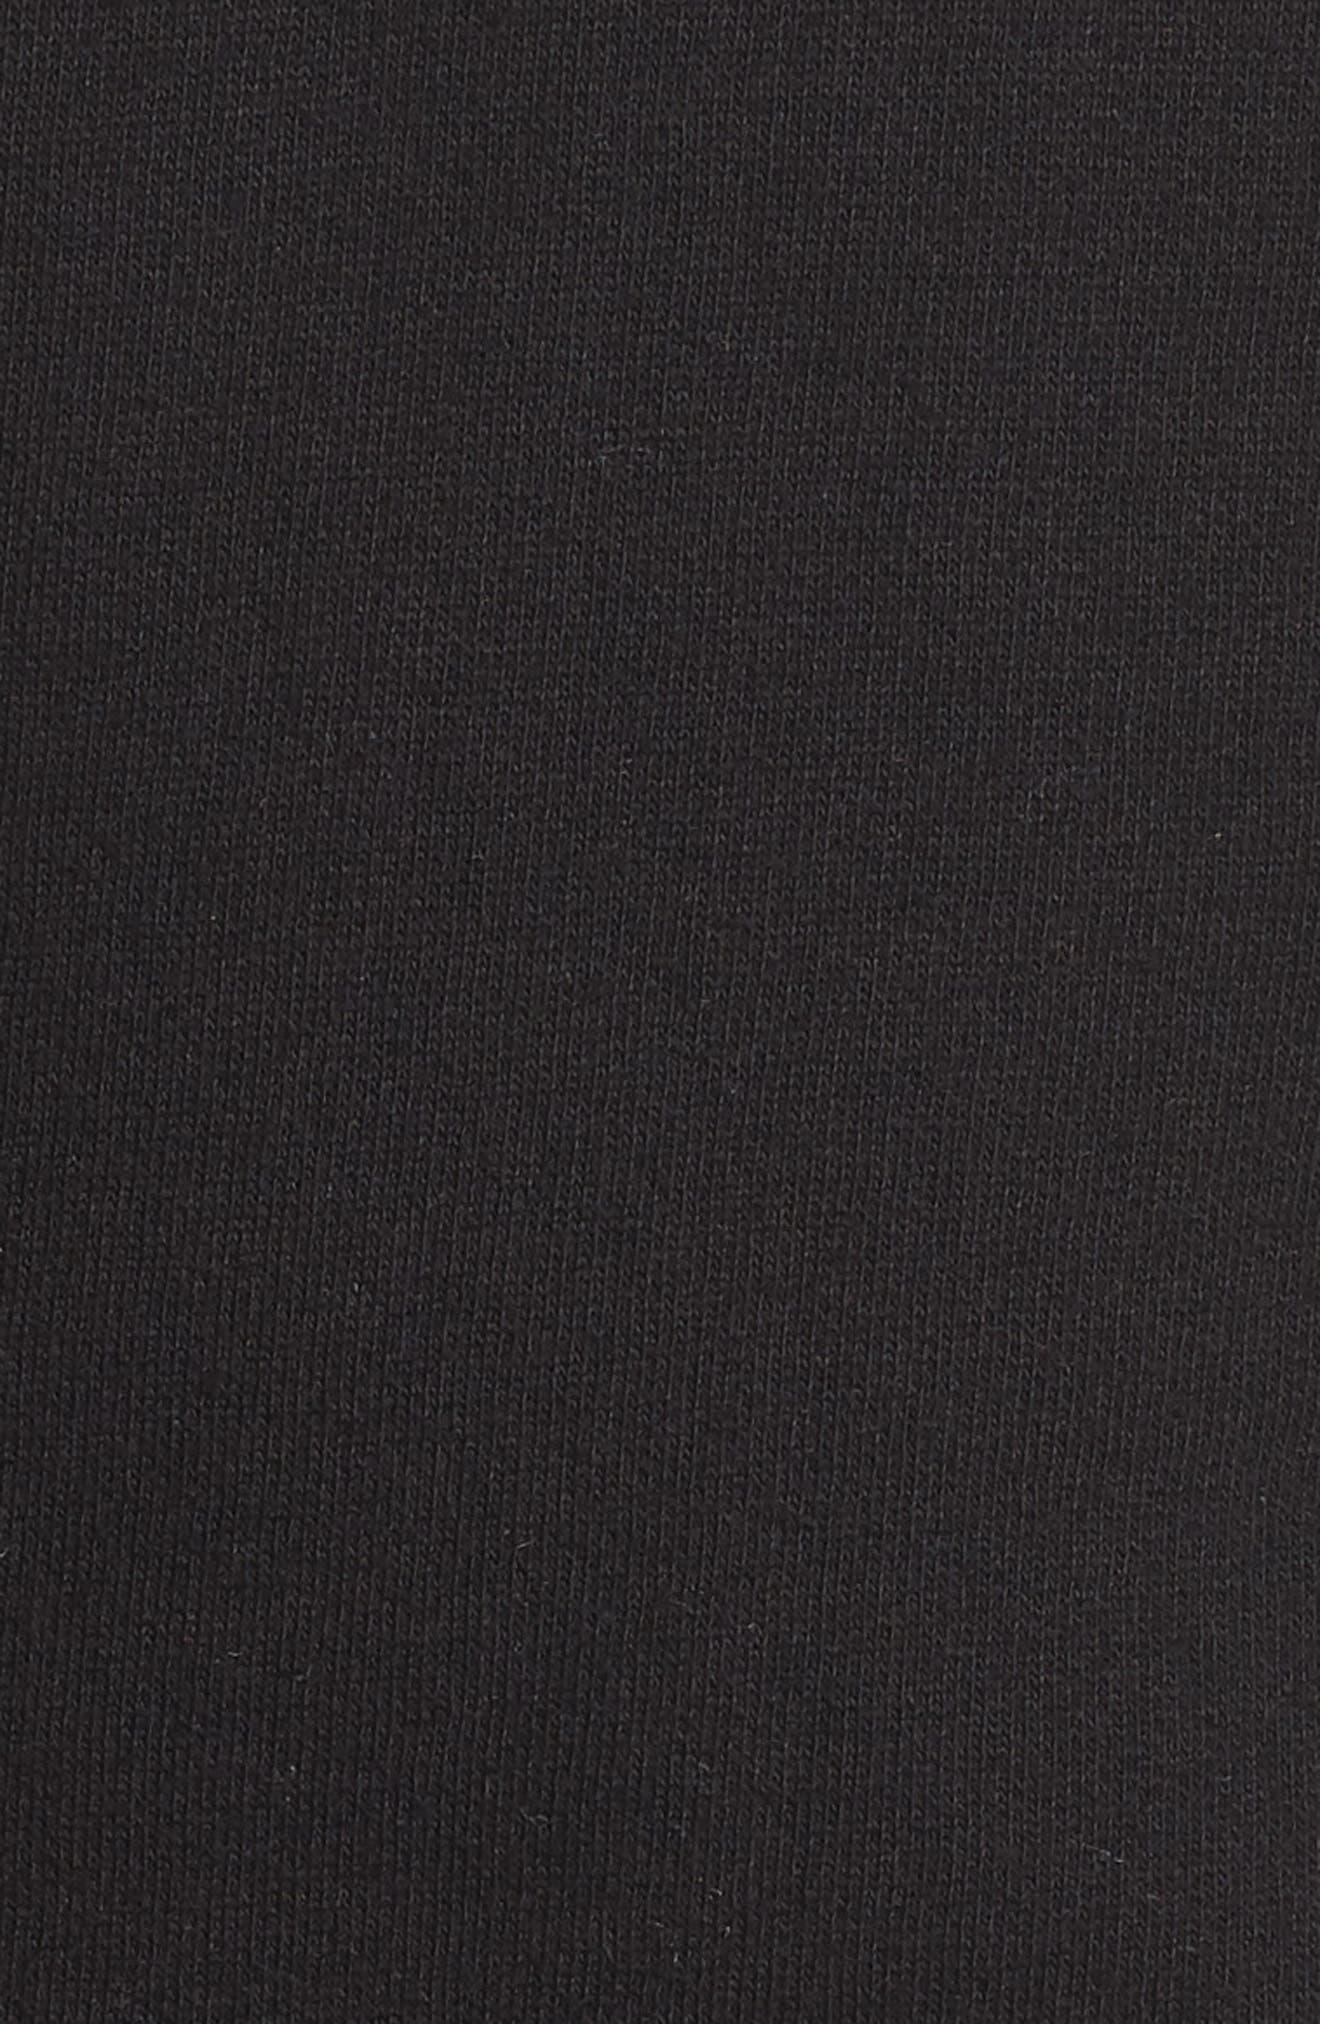 Rosé Okay Sweatshirt,                             Alternate thumbnail 5, color,                             BLACK